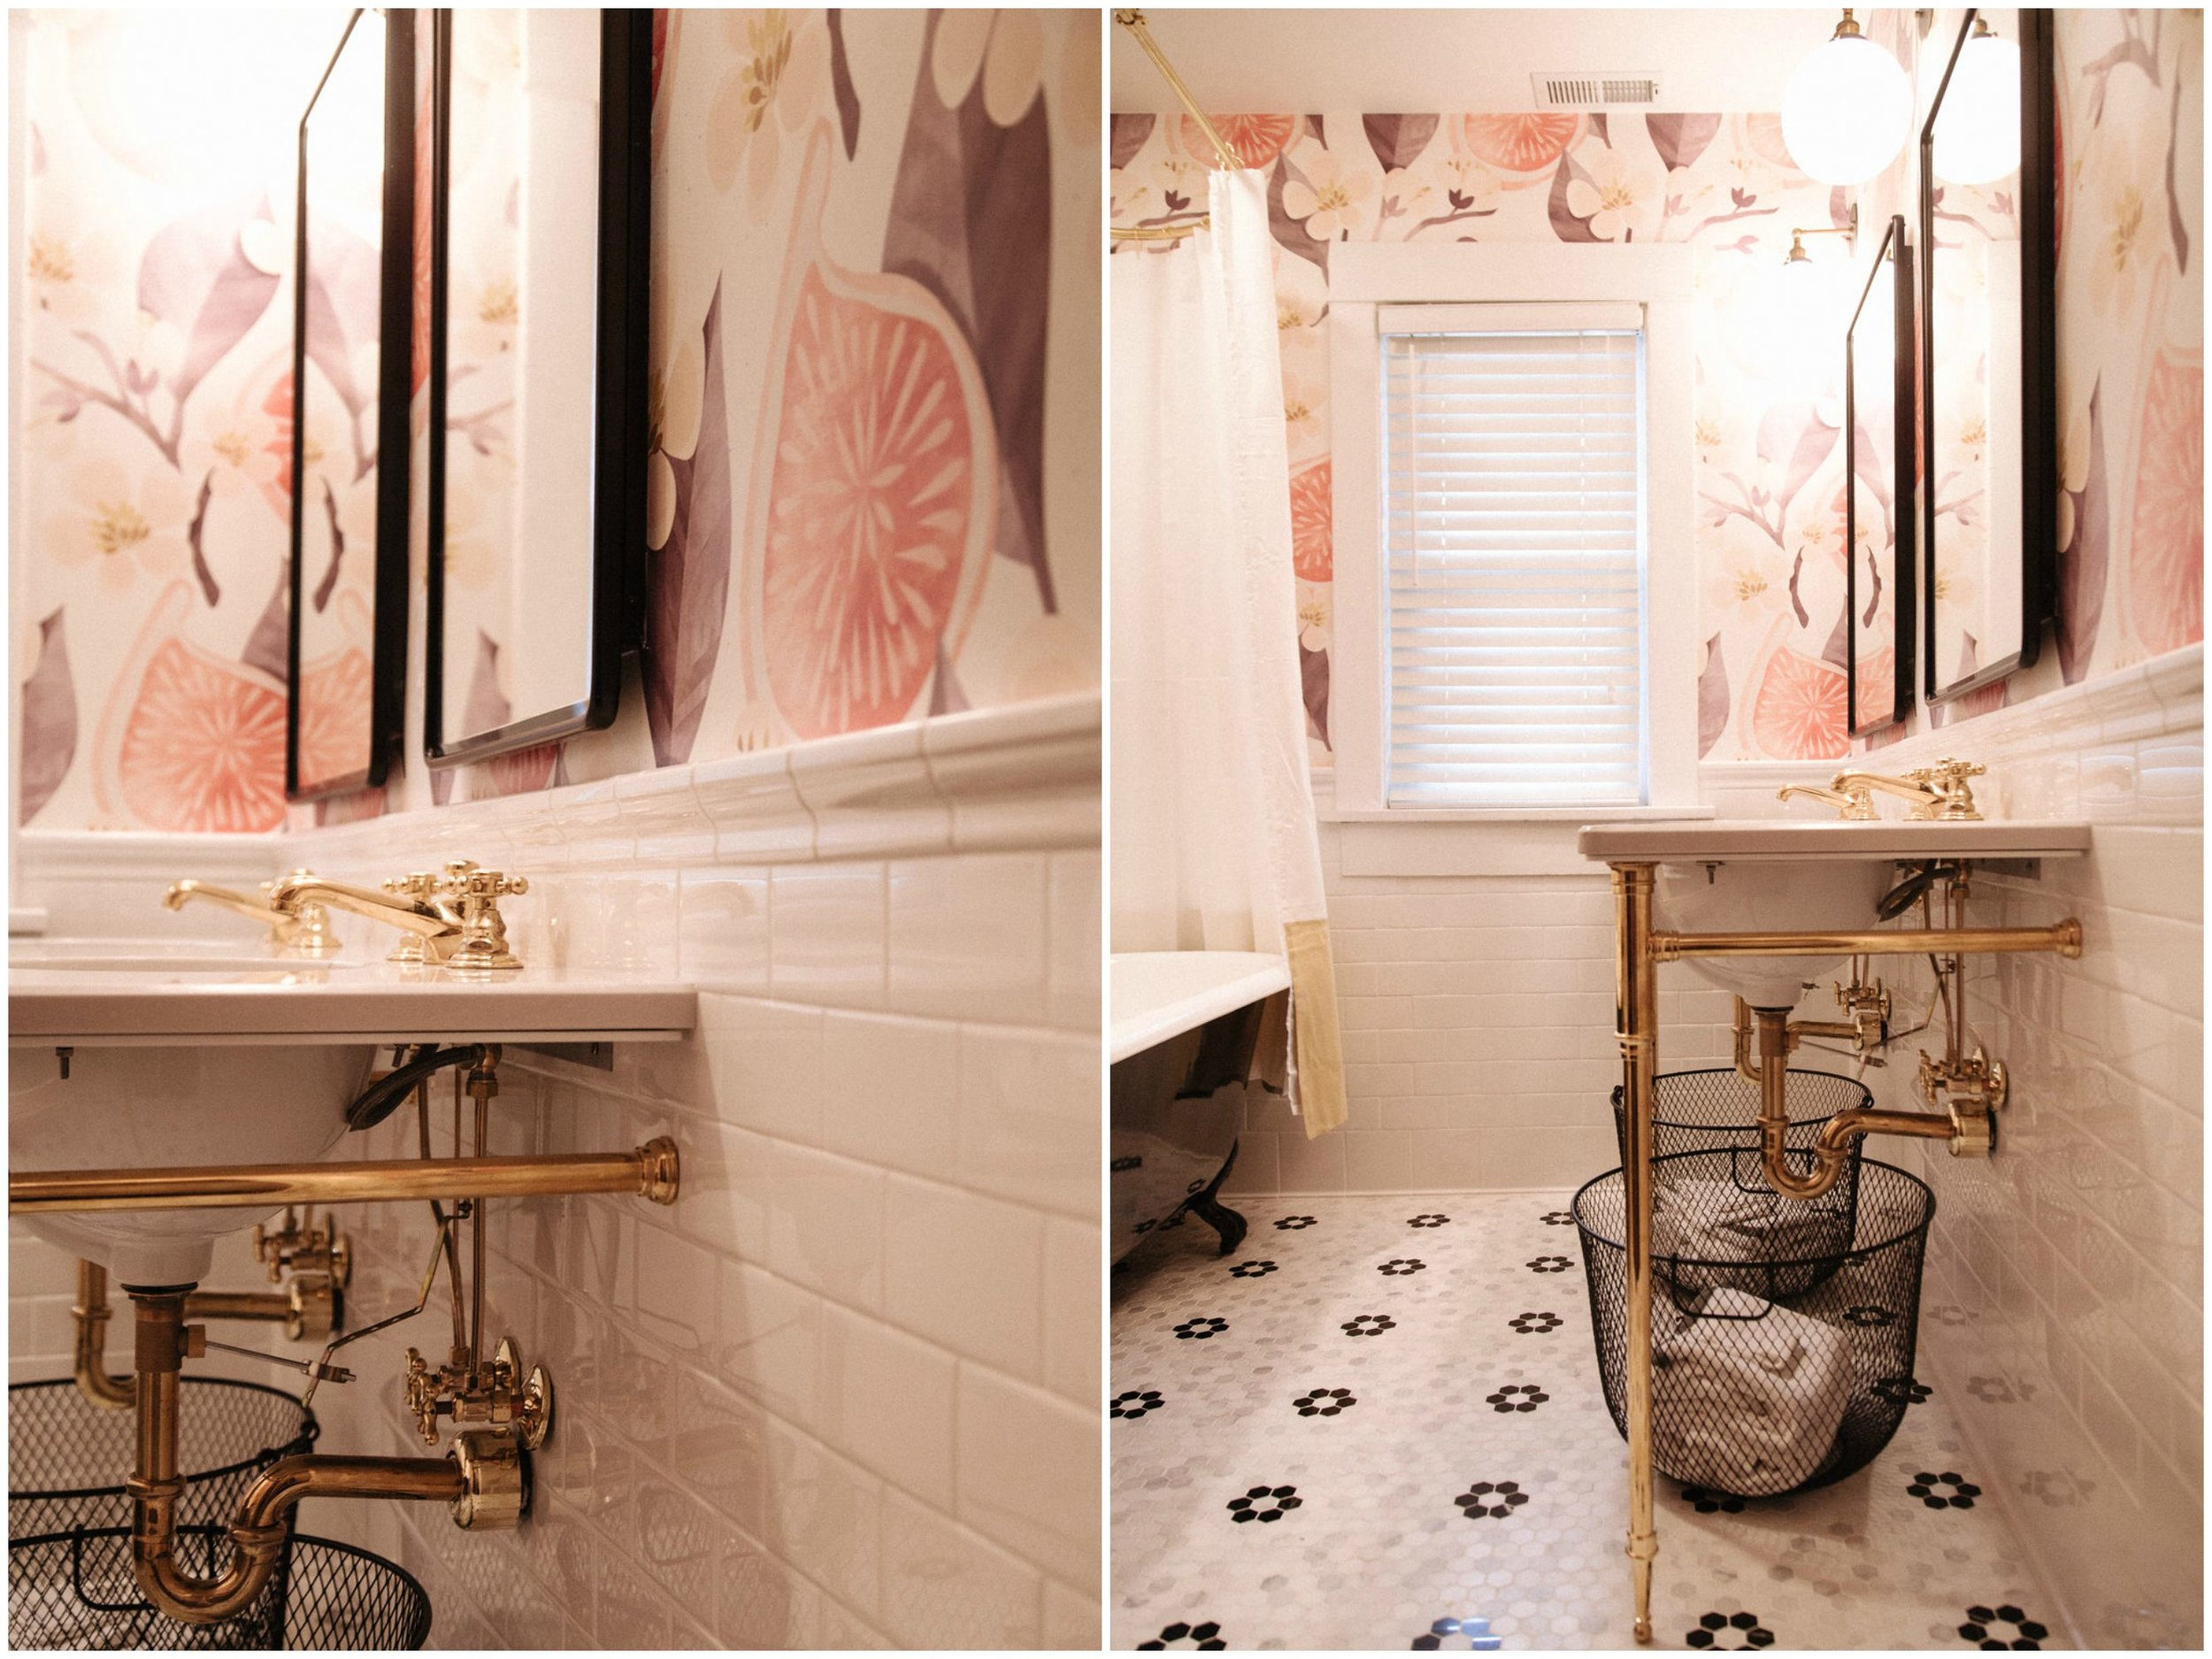 TPOH Bathroom Collage.jpg